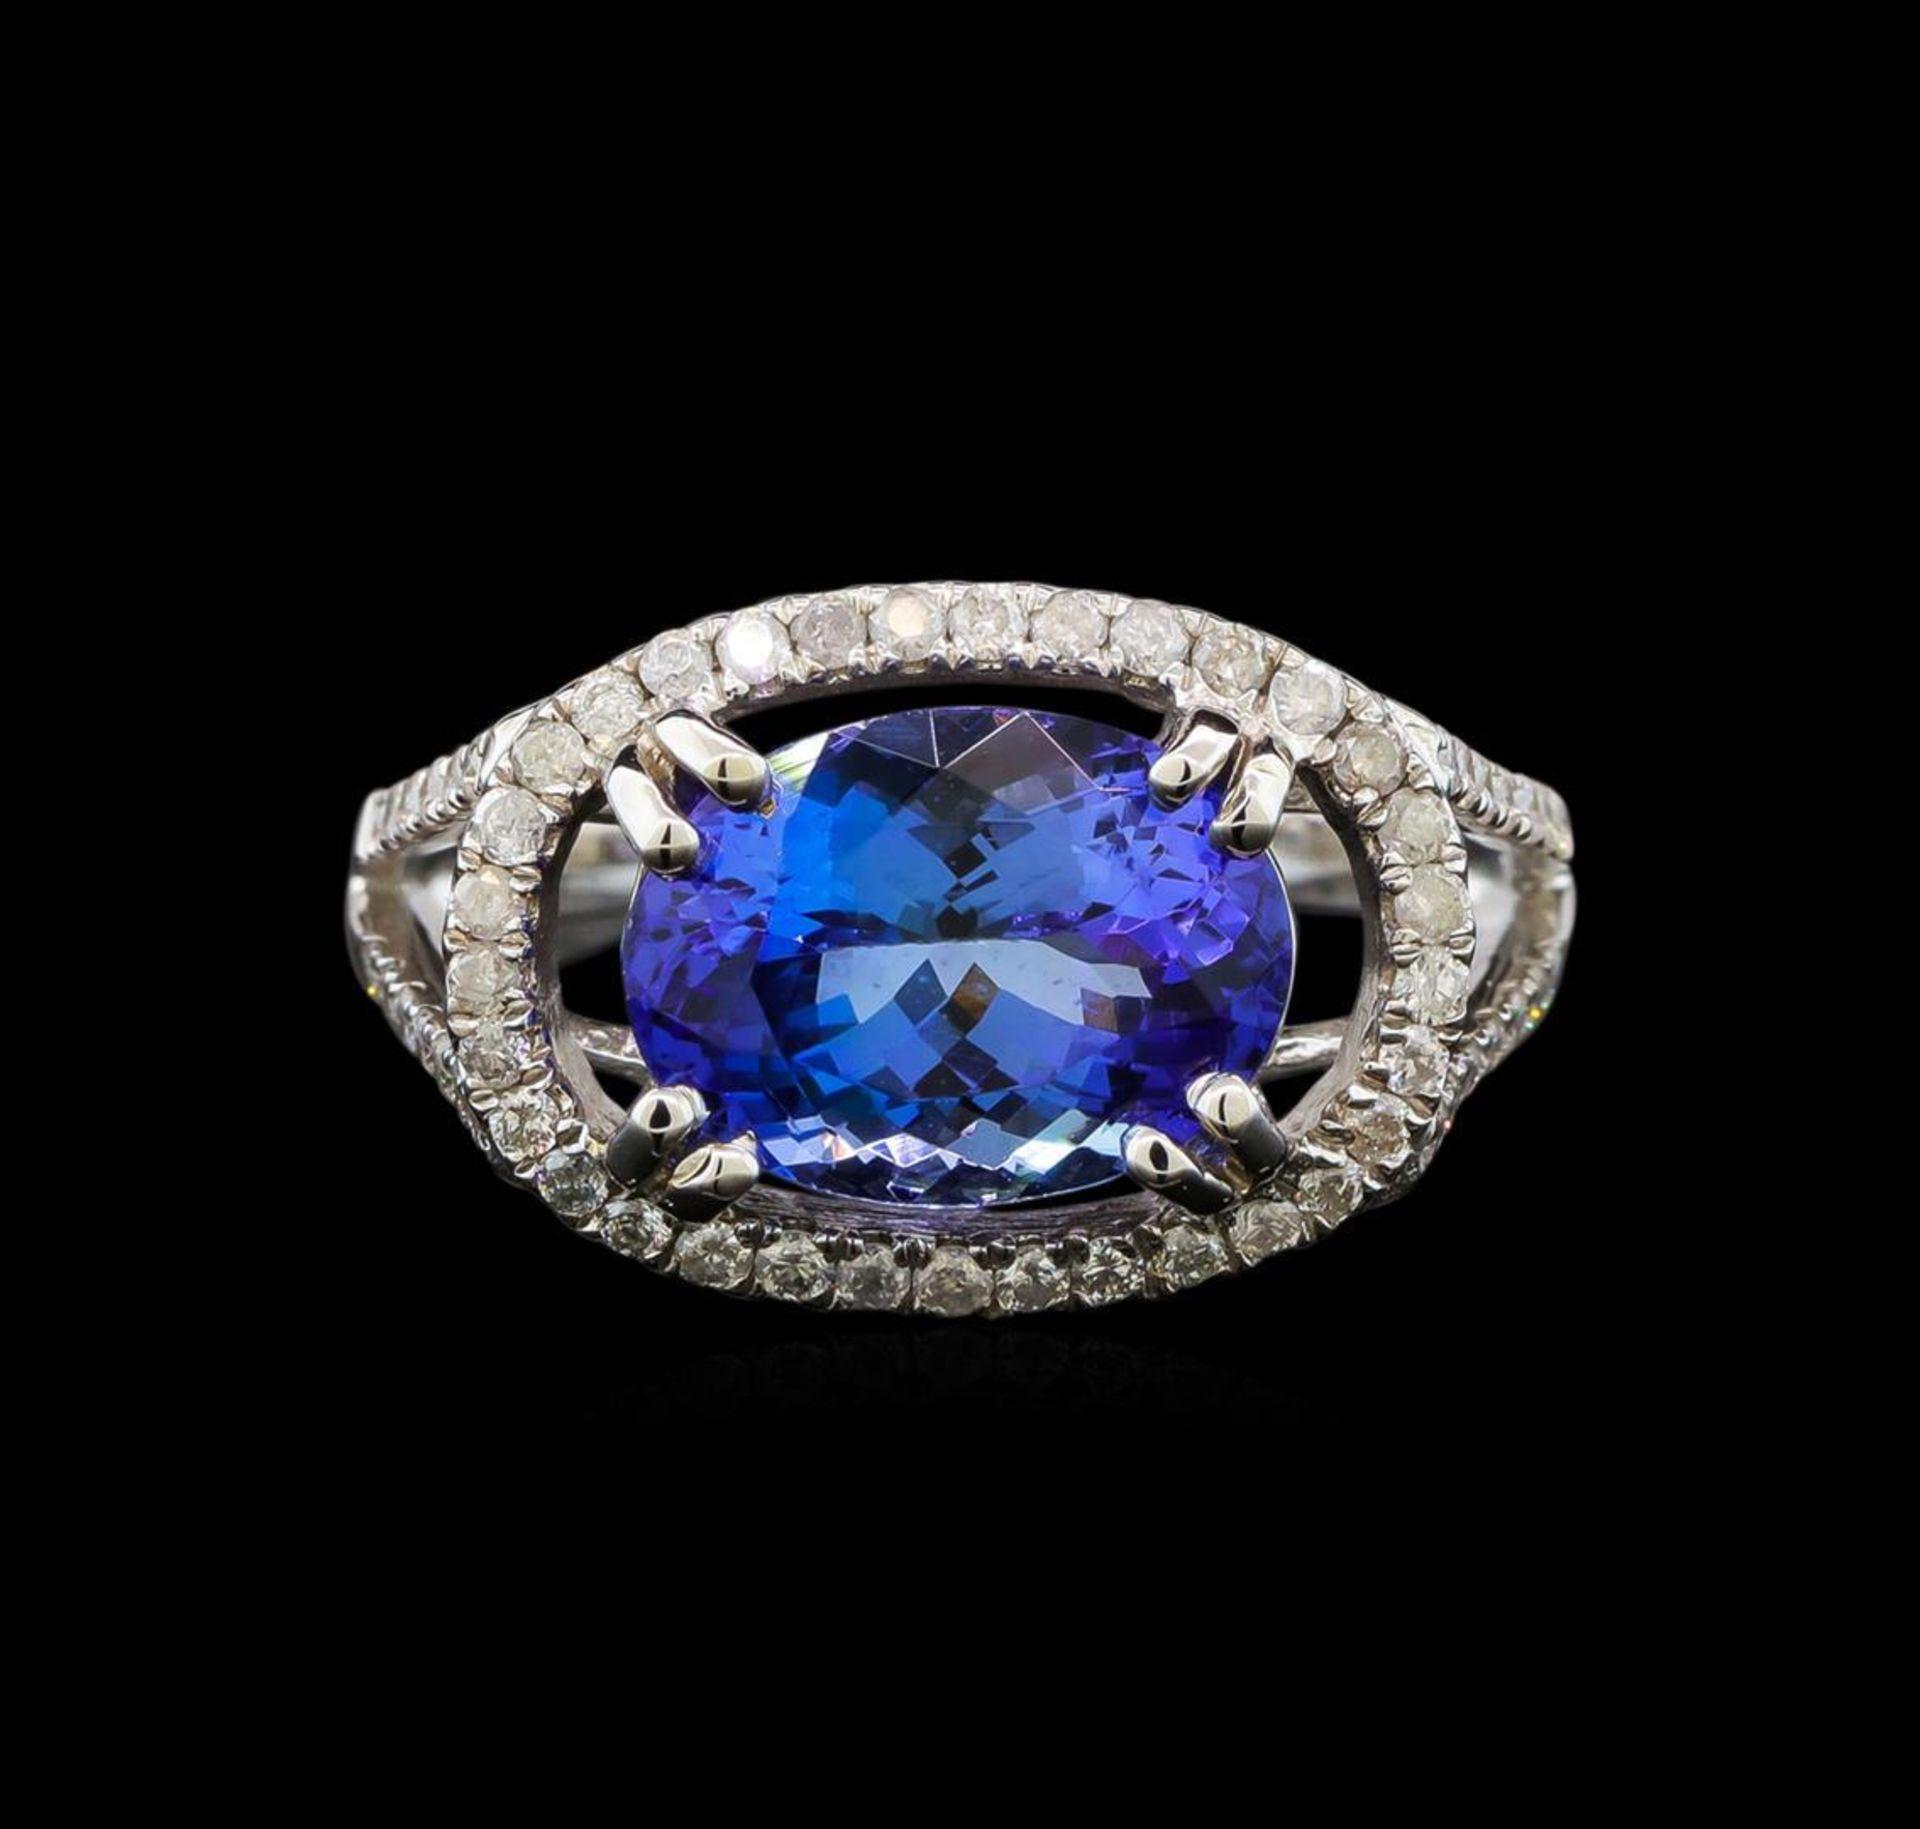 14KT White Gold 4.14 ctw Tanzanite and Diamond Ring - Image 2 of 5